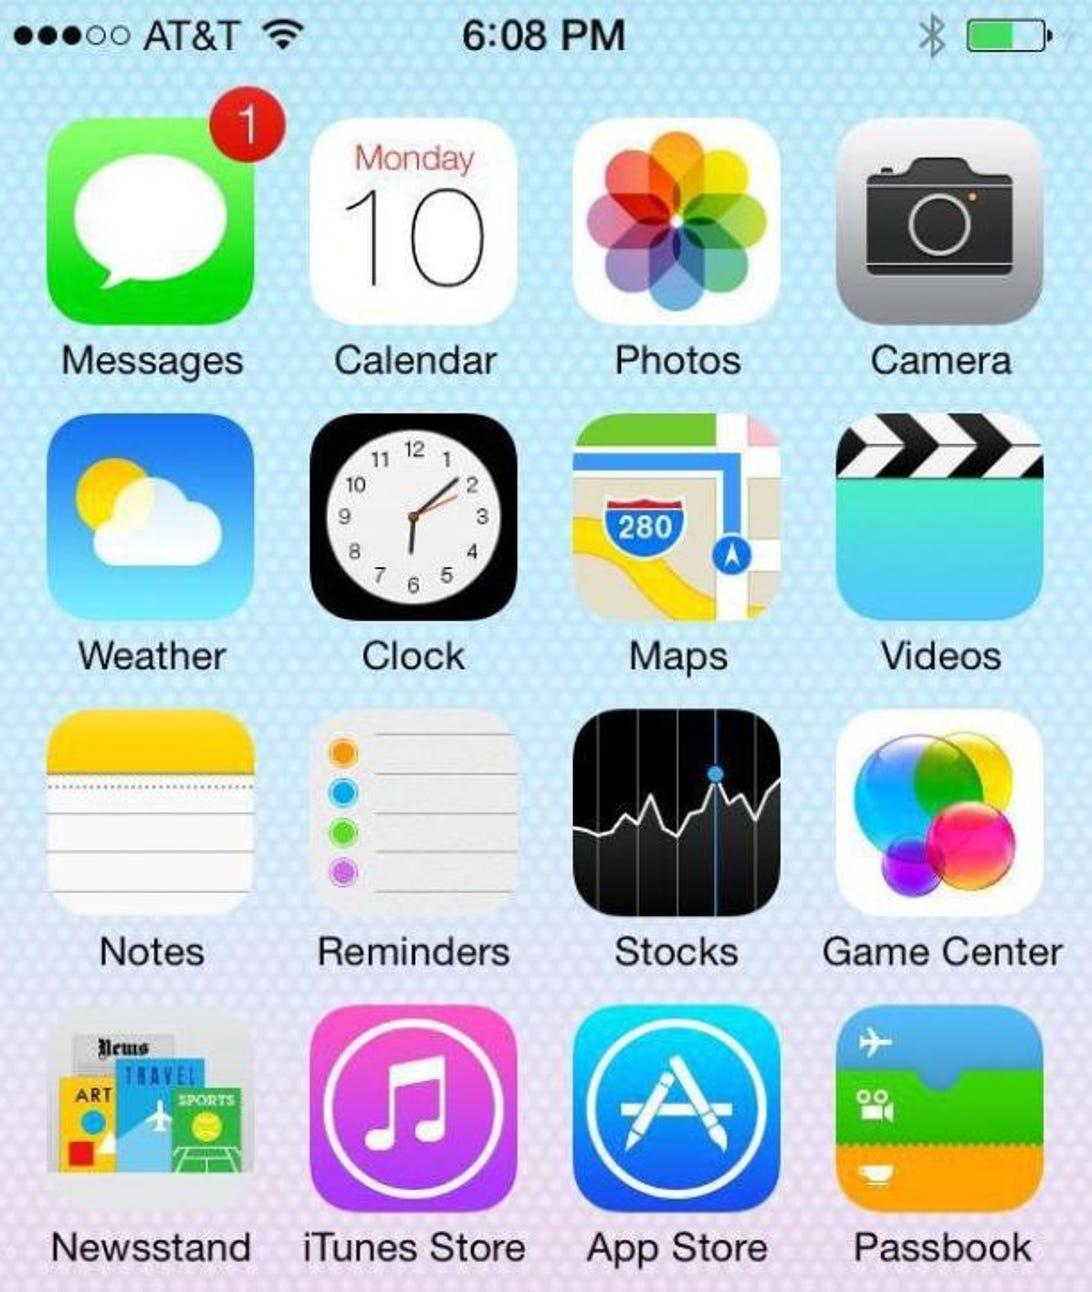 iOS_7_icons_610x722.jpg